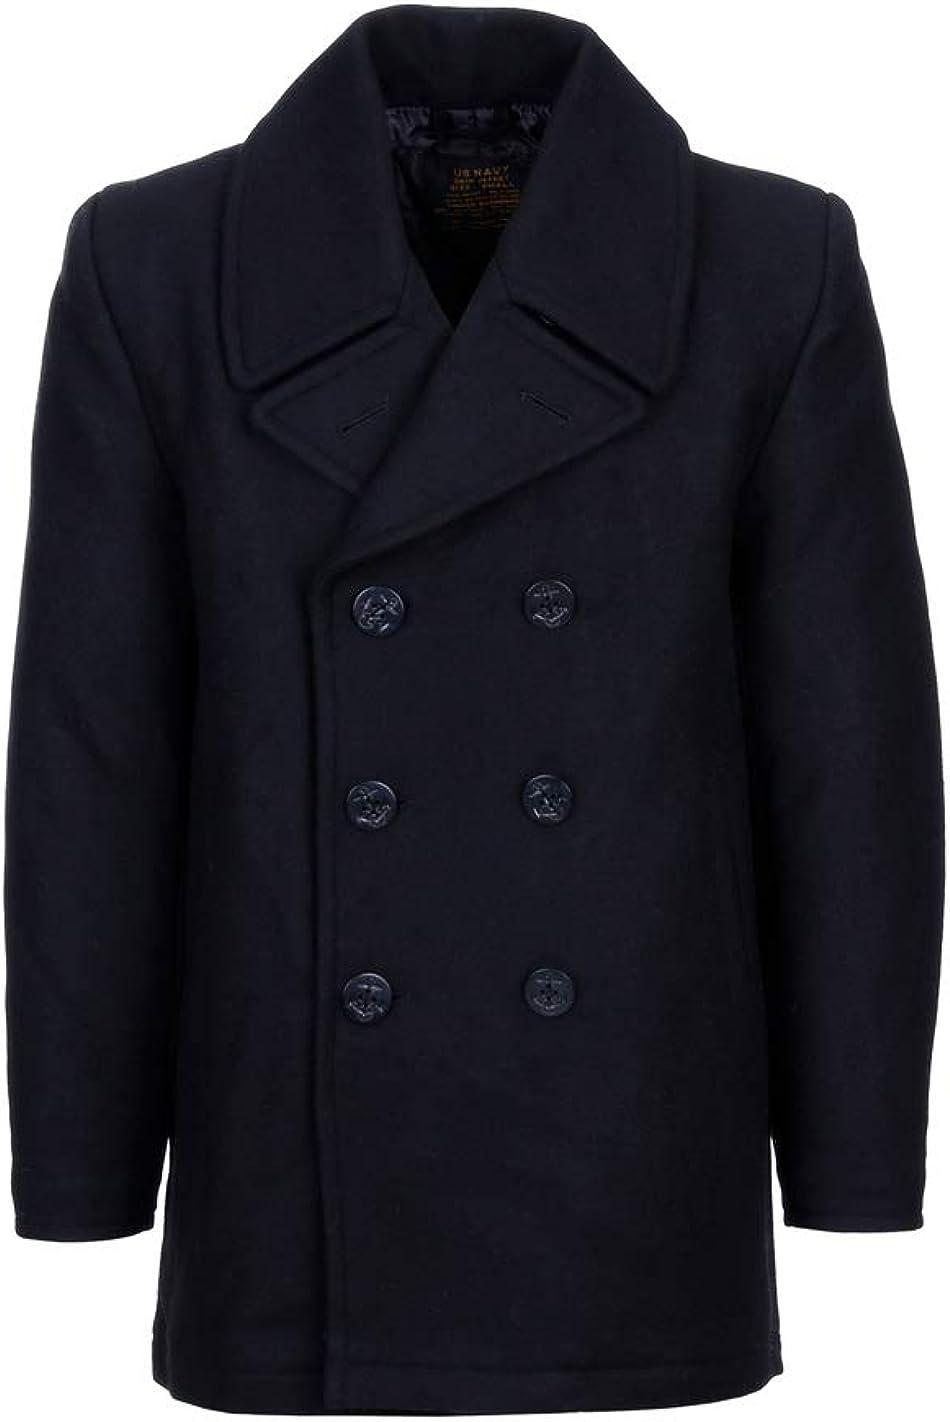 Cappotto Nero in Lana Doppiopetto US Navy Deck Jacket Pea Coat Marina Americana Fostex Garments